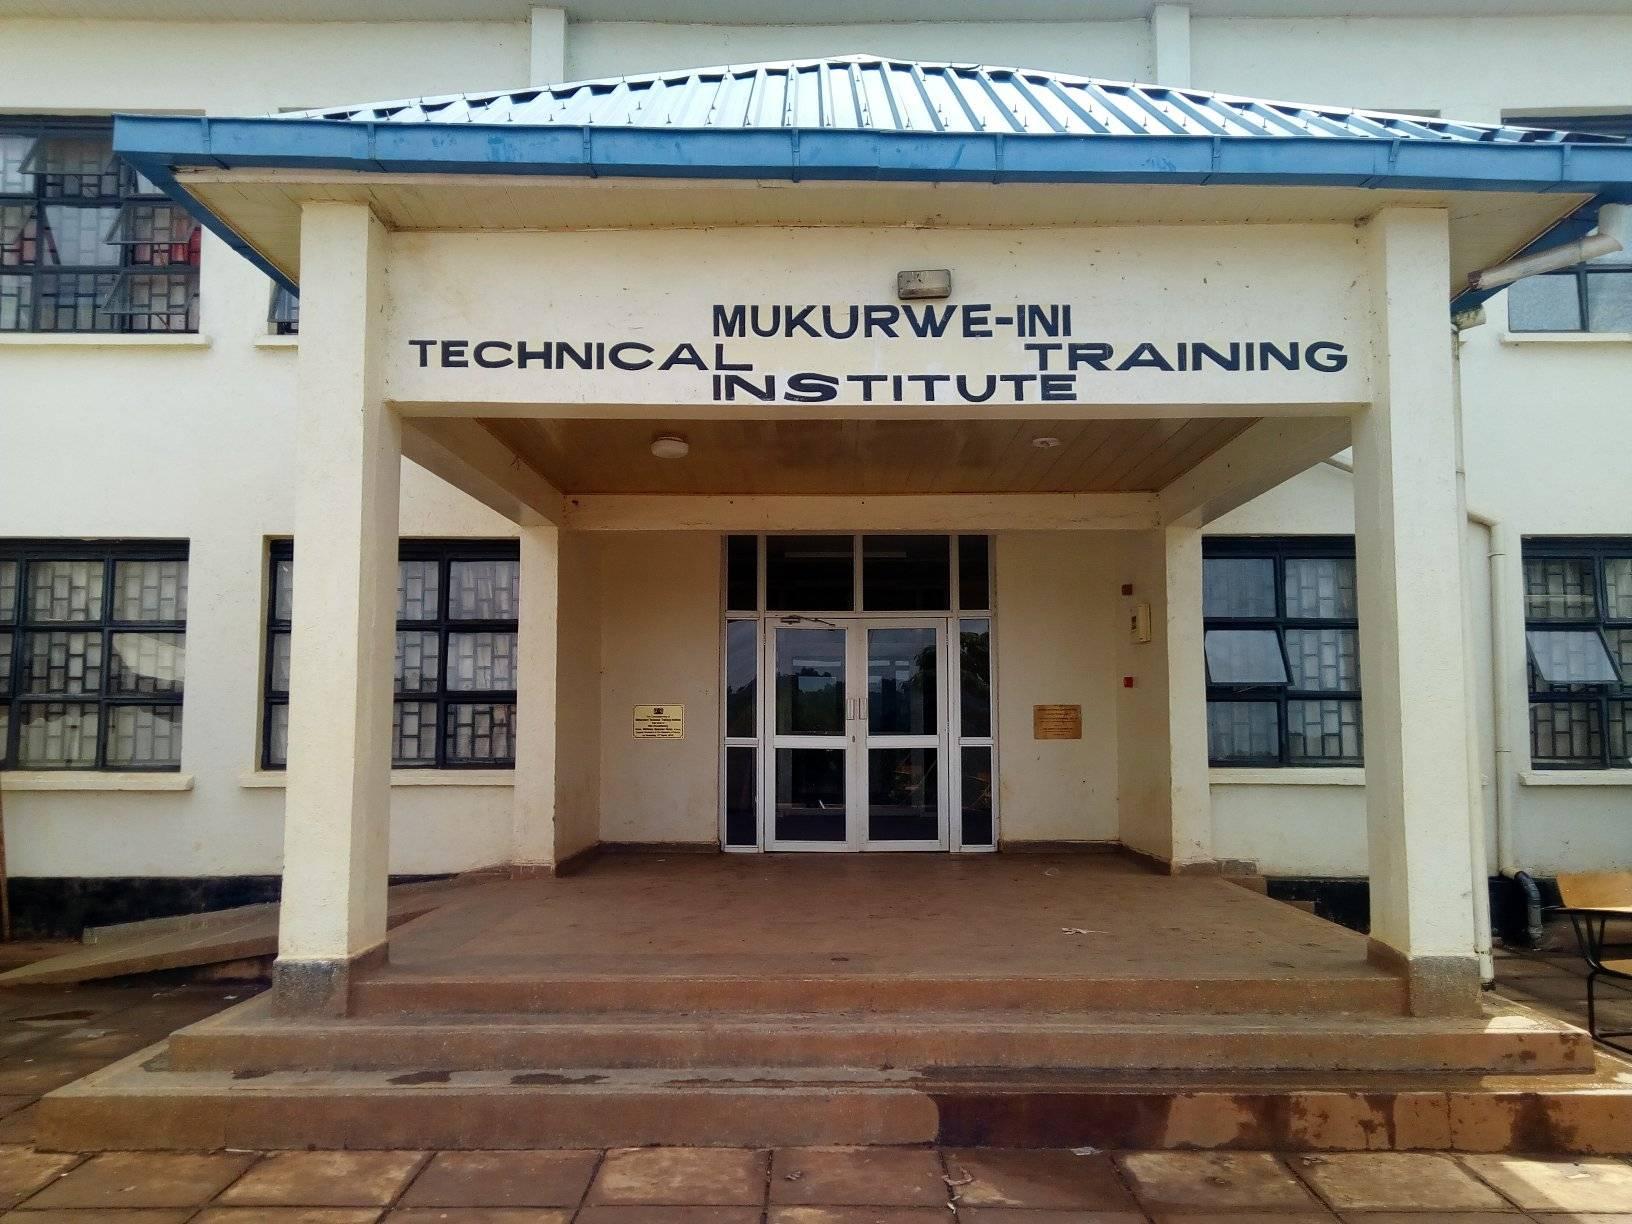 Mukurweini Technical Training Institute